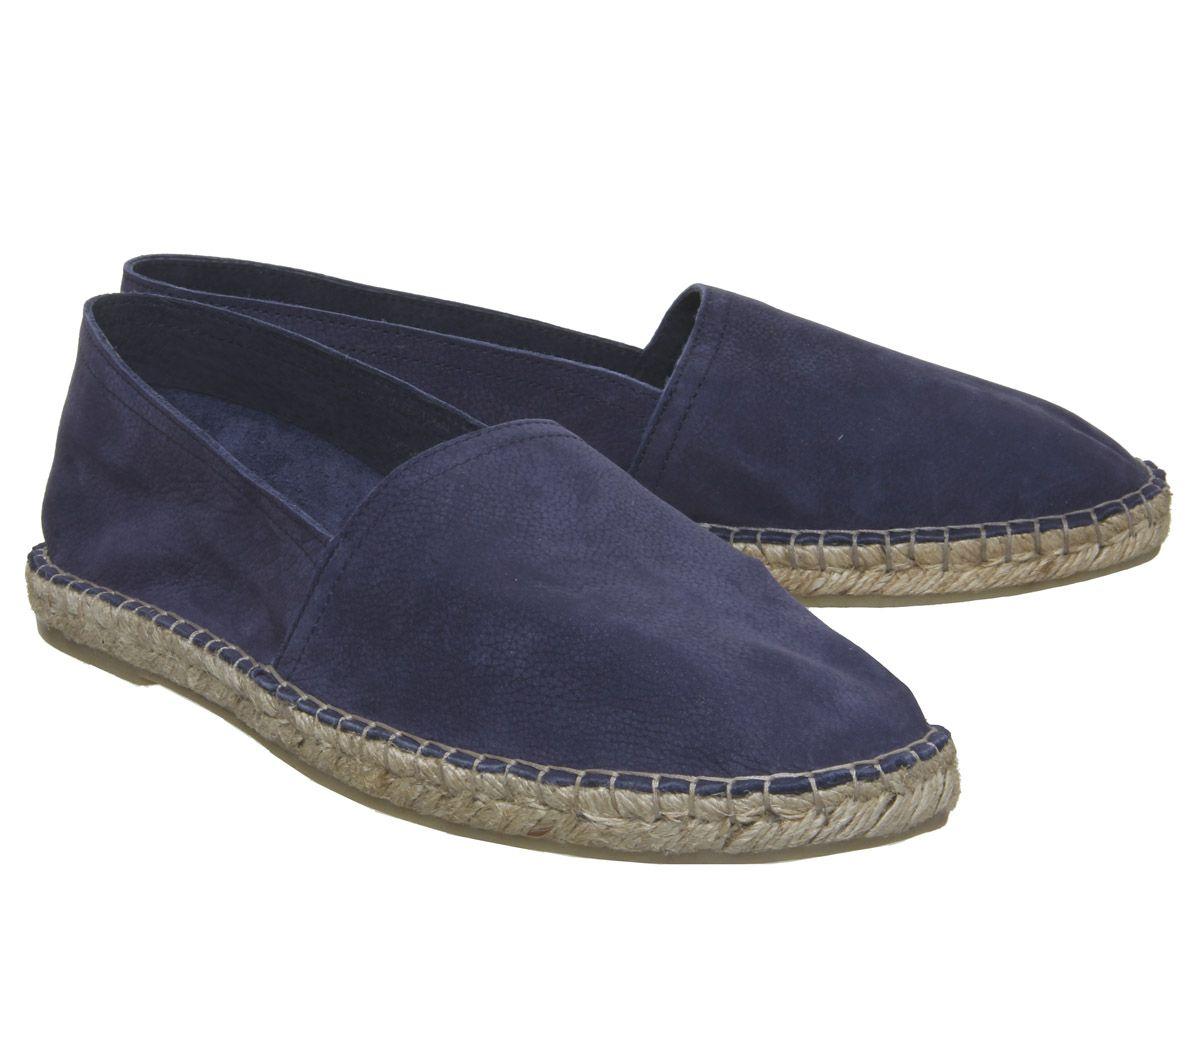 Mens-Office-Luca-Espadrilles-Navy-Nubuck-Casual-Shoes thumbnail 7